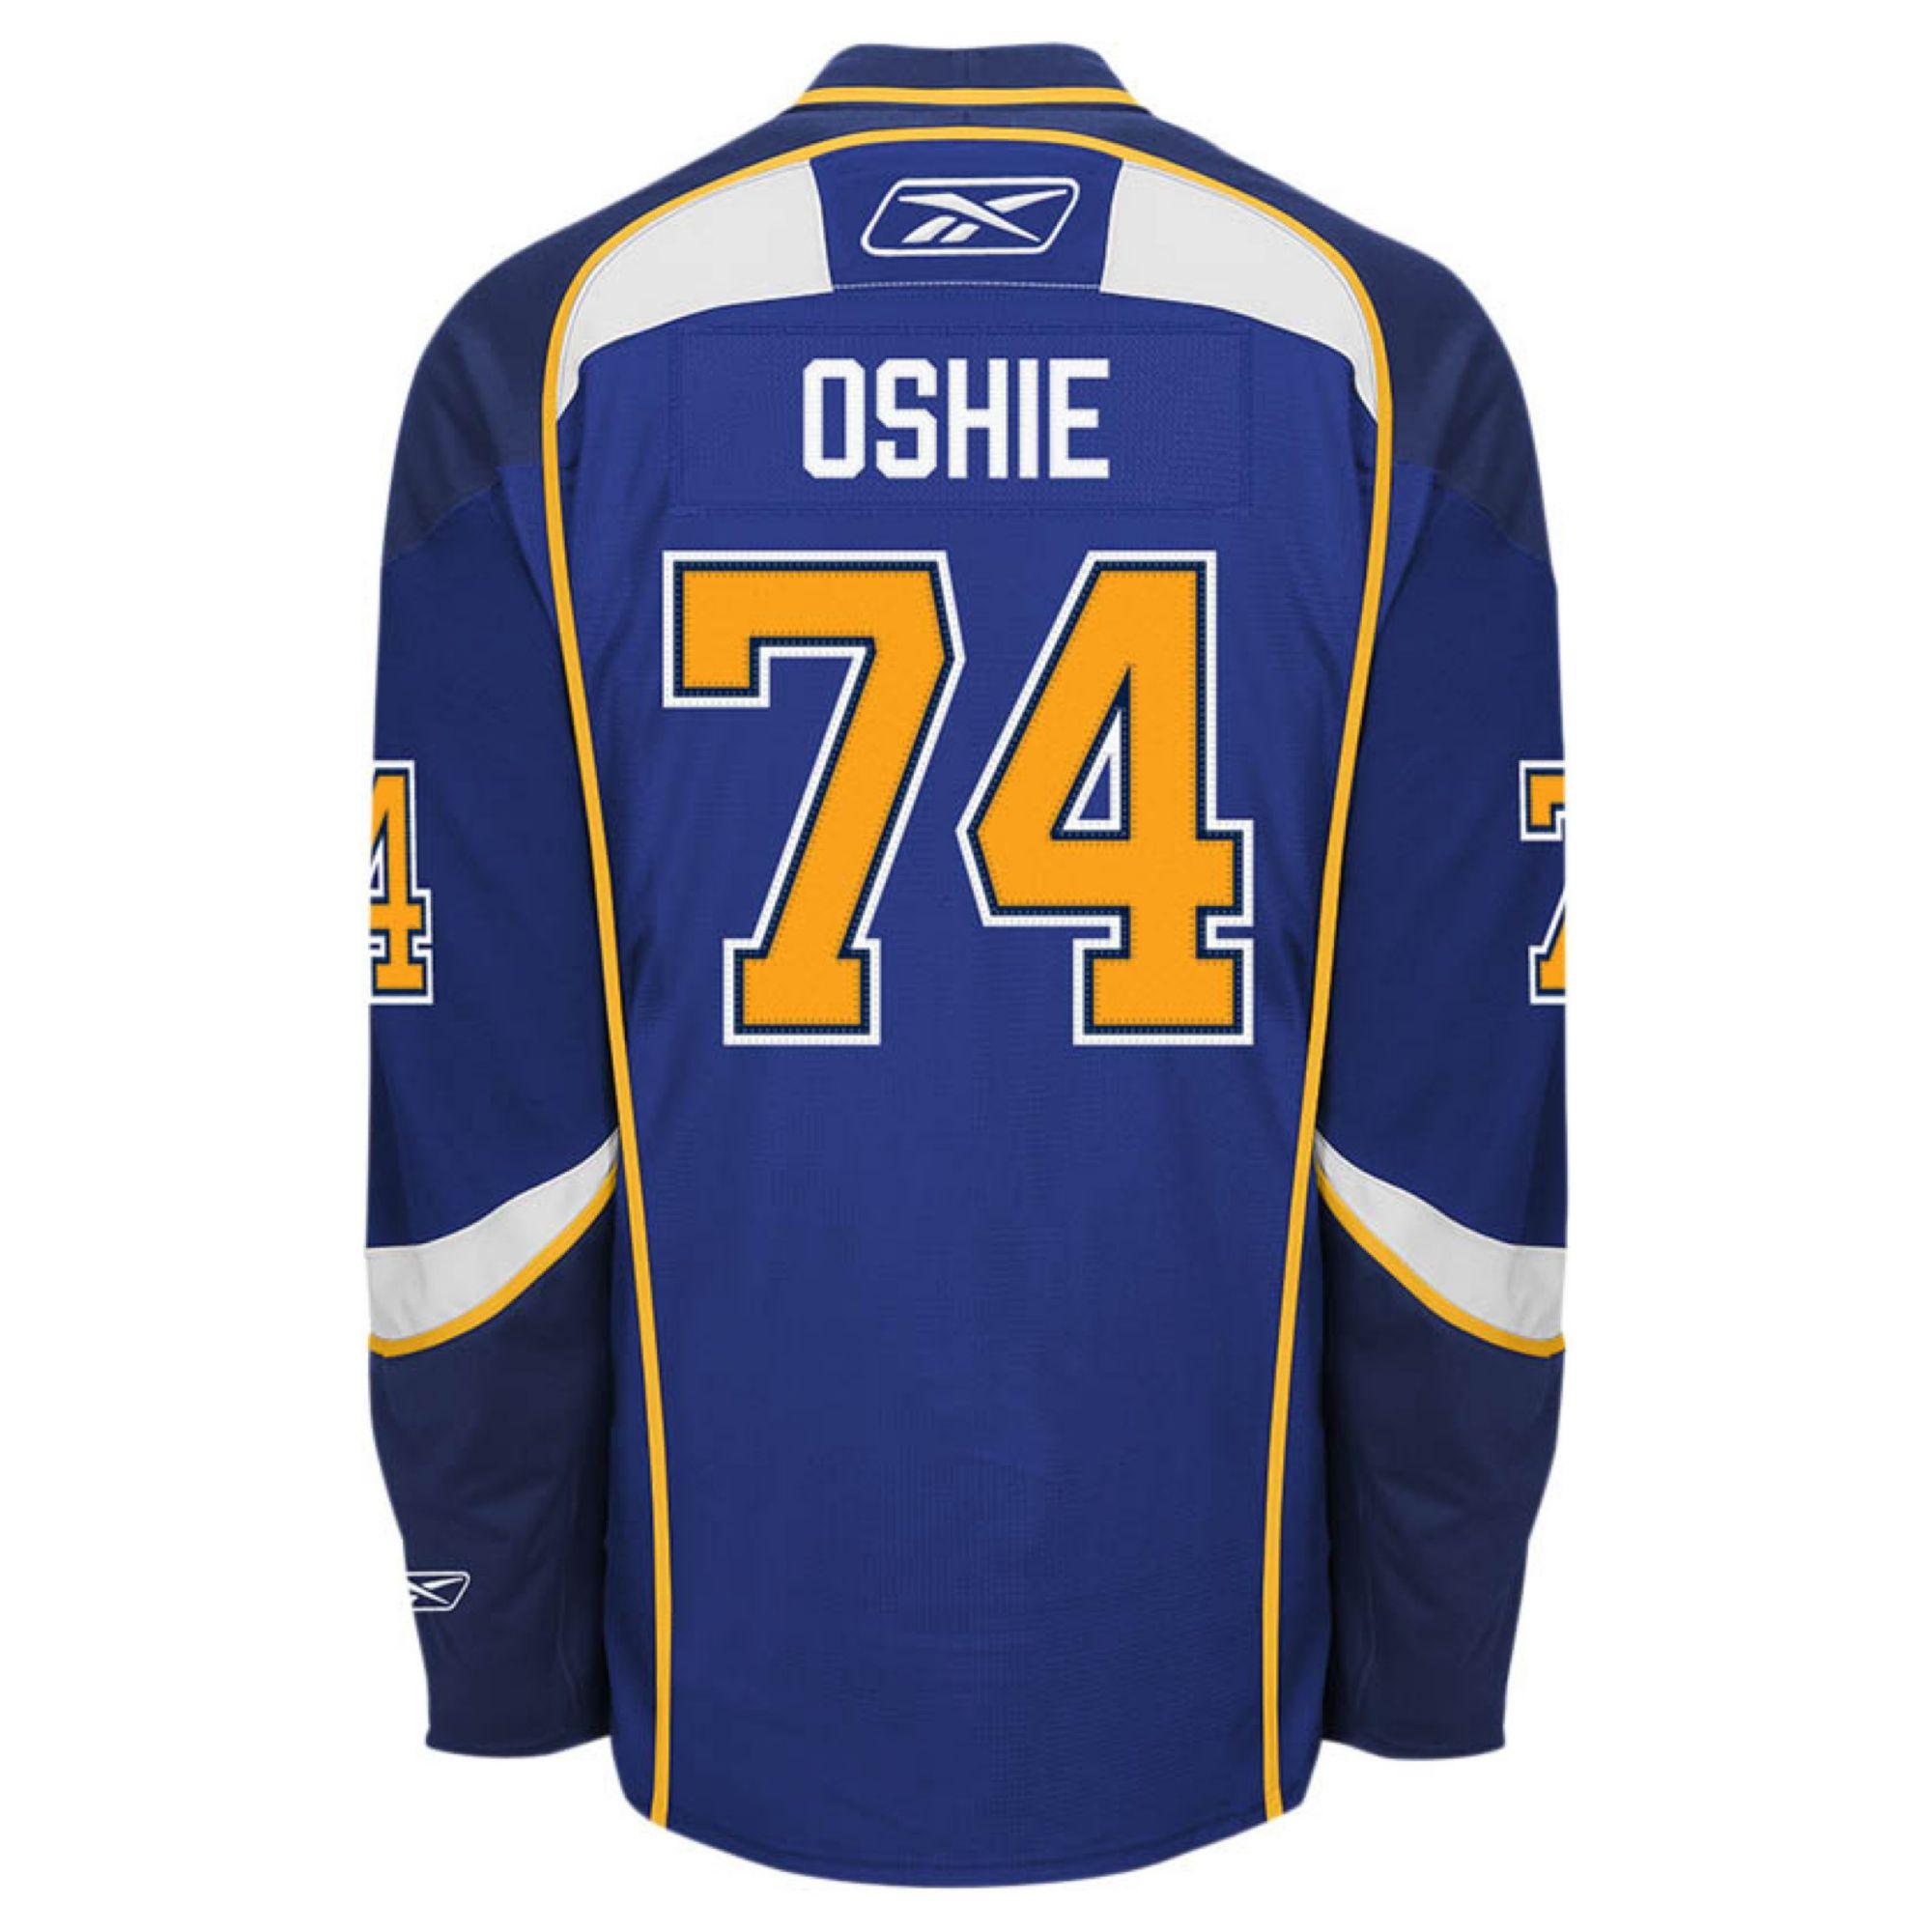 d3dc3ff53abd Lyst - Reebok Mens Tj Oshie St Louis Blues Premier Jersey in Blue ...